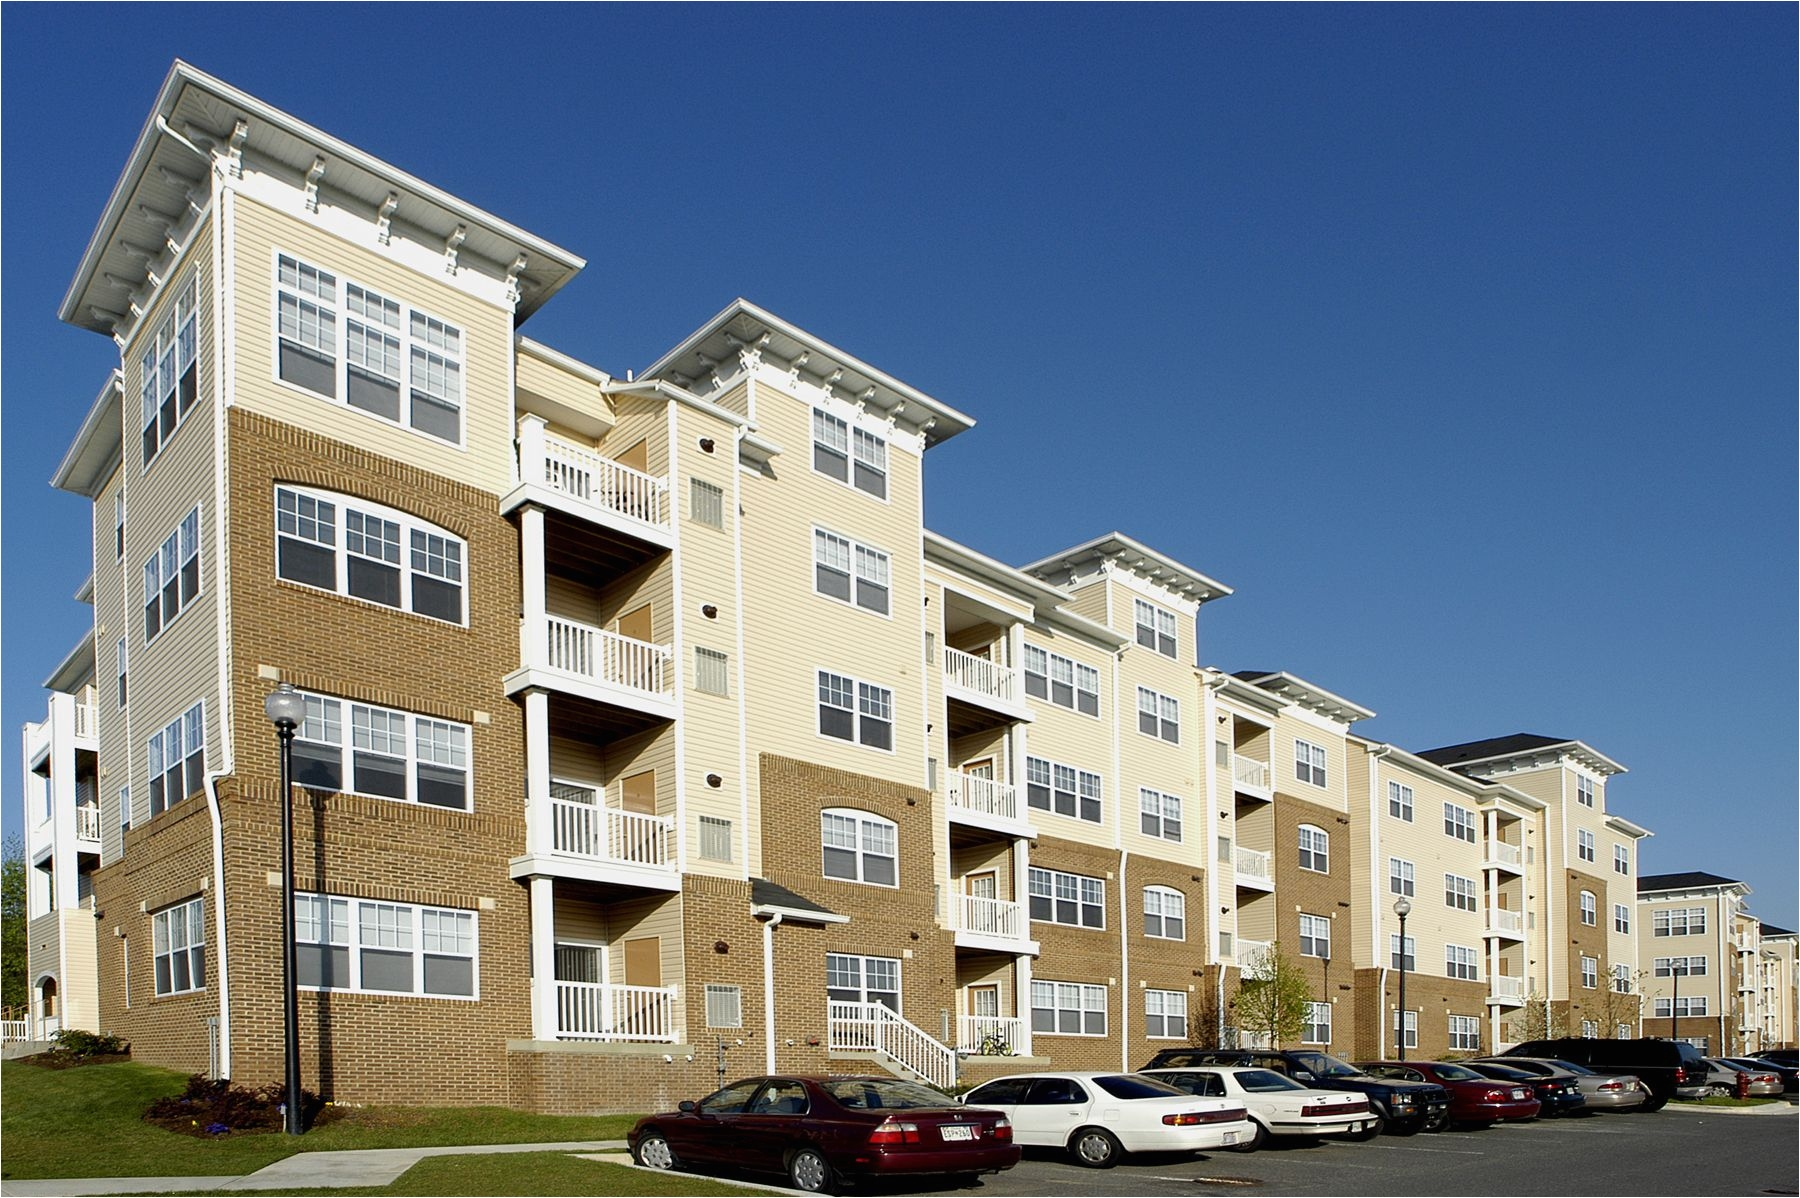 located in largo md truman park has 284 apartment homes